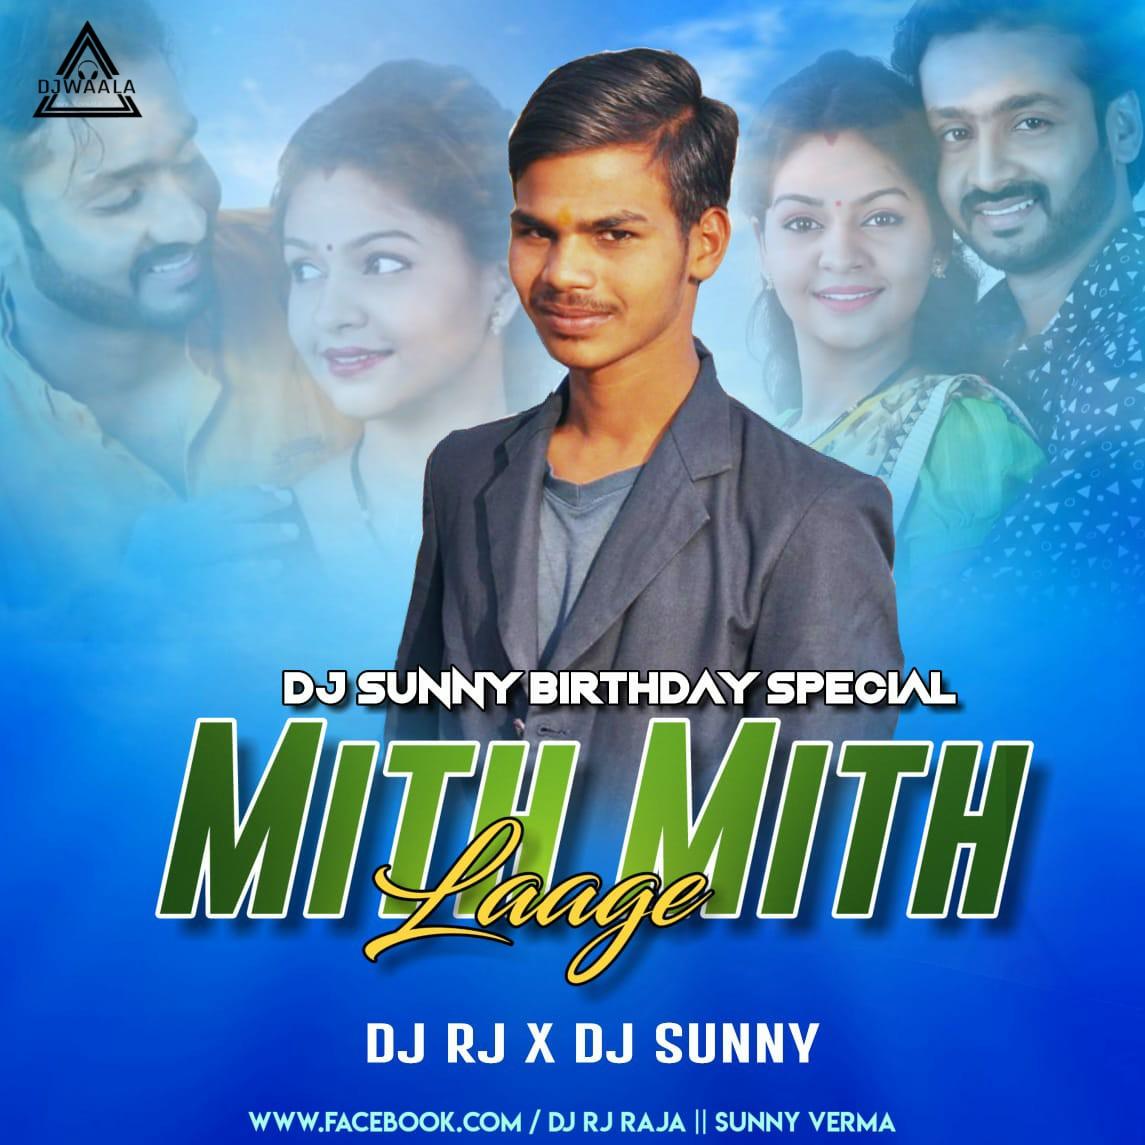 MITH MITH LAGE - CG - DJ RJ EXCLUSIVE X DJ SUNNY - djwaala in